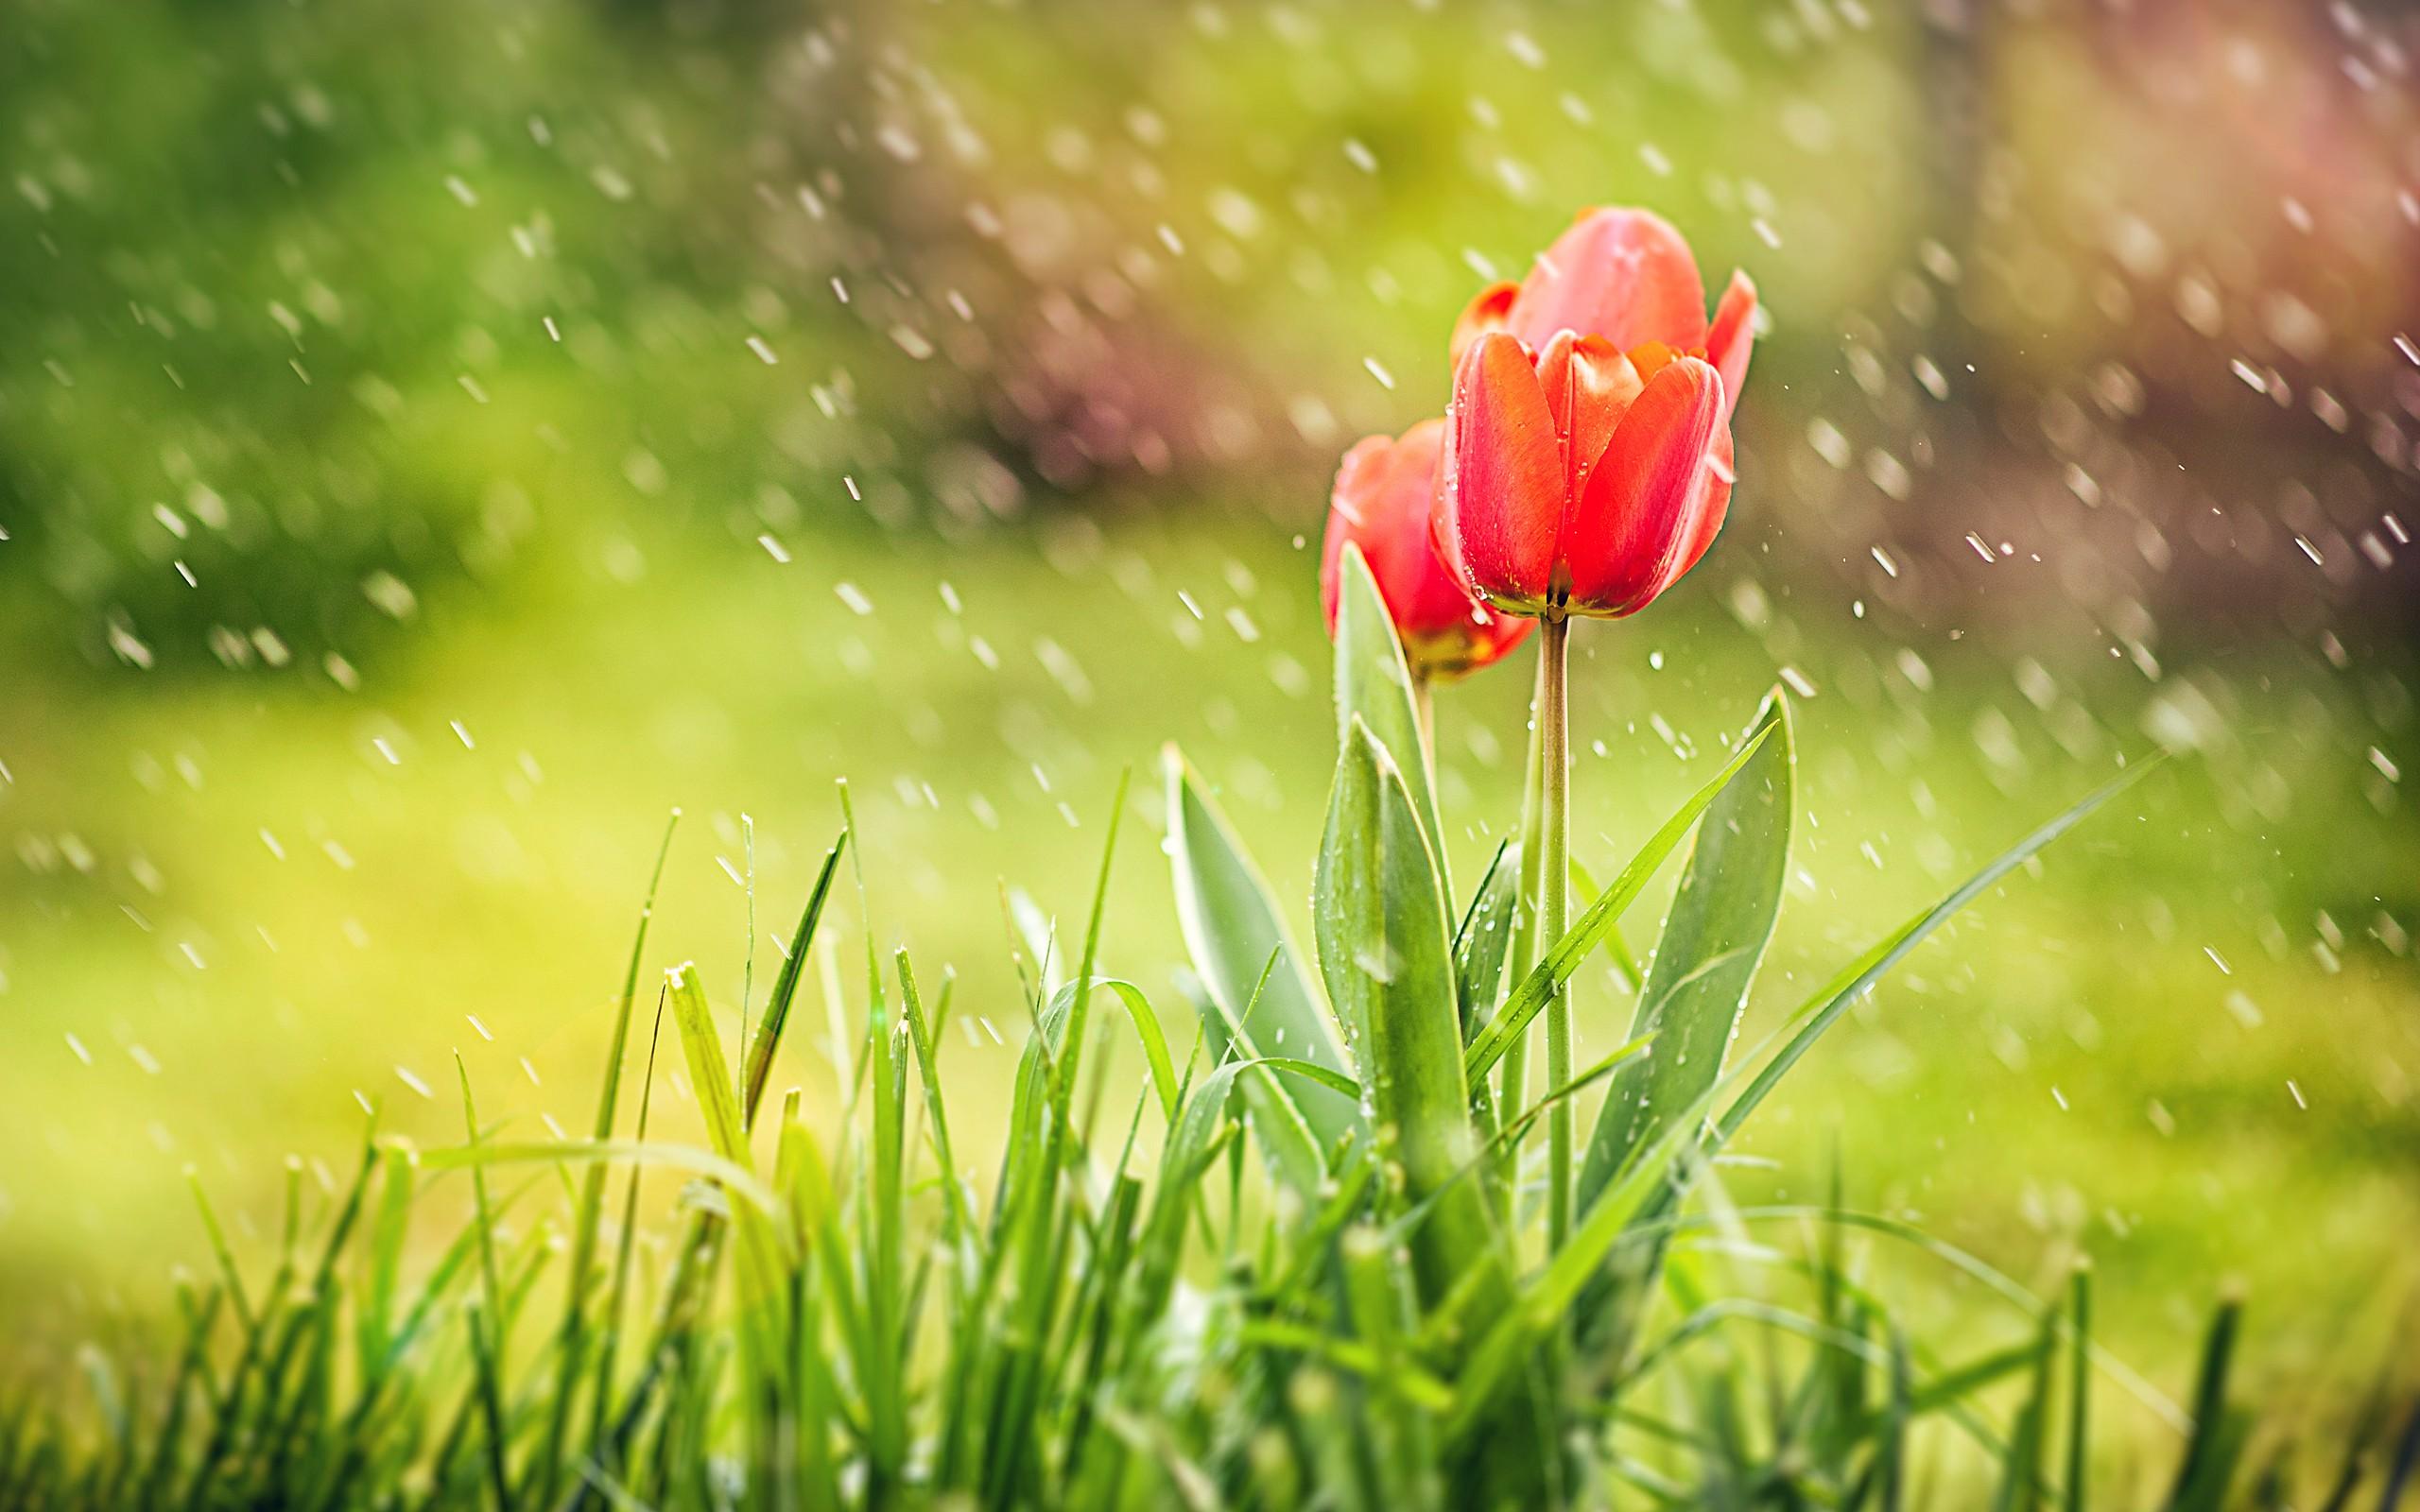 April spring backgrounds banner transparent download Spring Tulips Flowers Grass Rain Nature HD Wallpaper - New HD ... banner transparent download